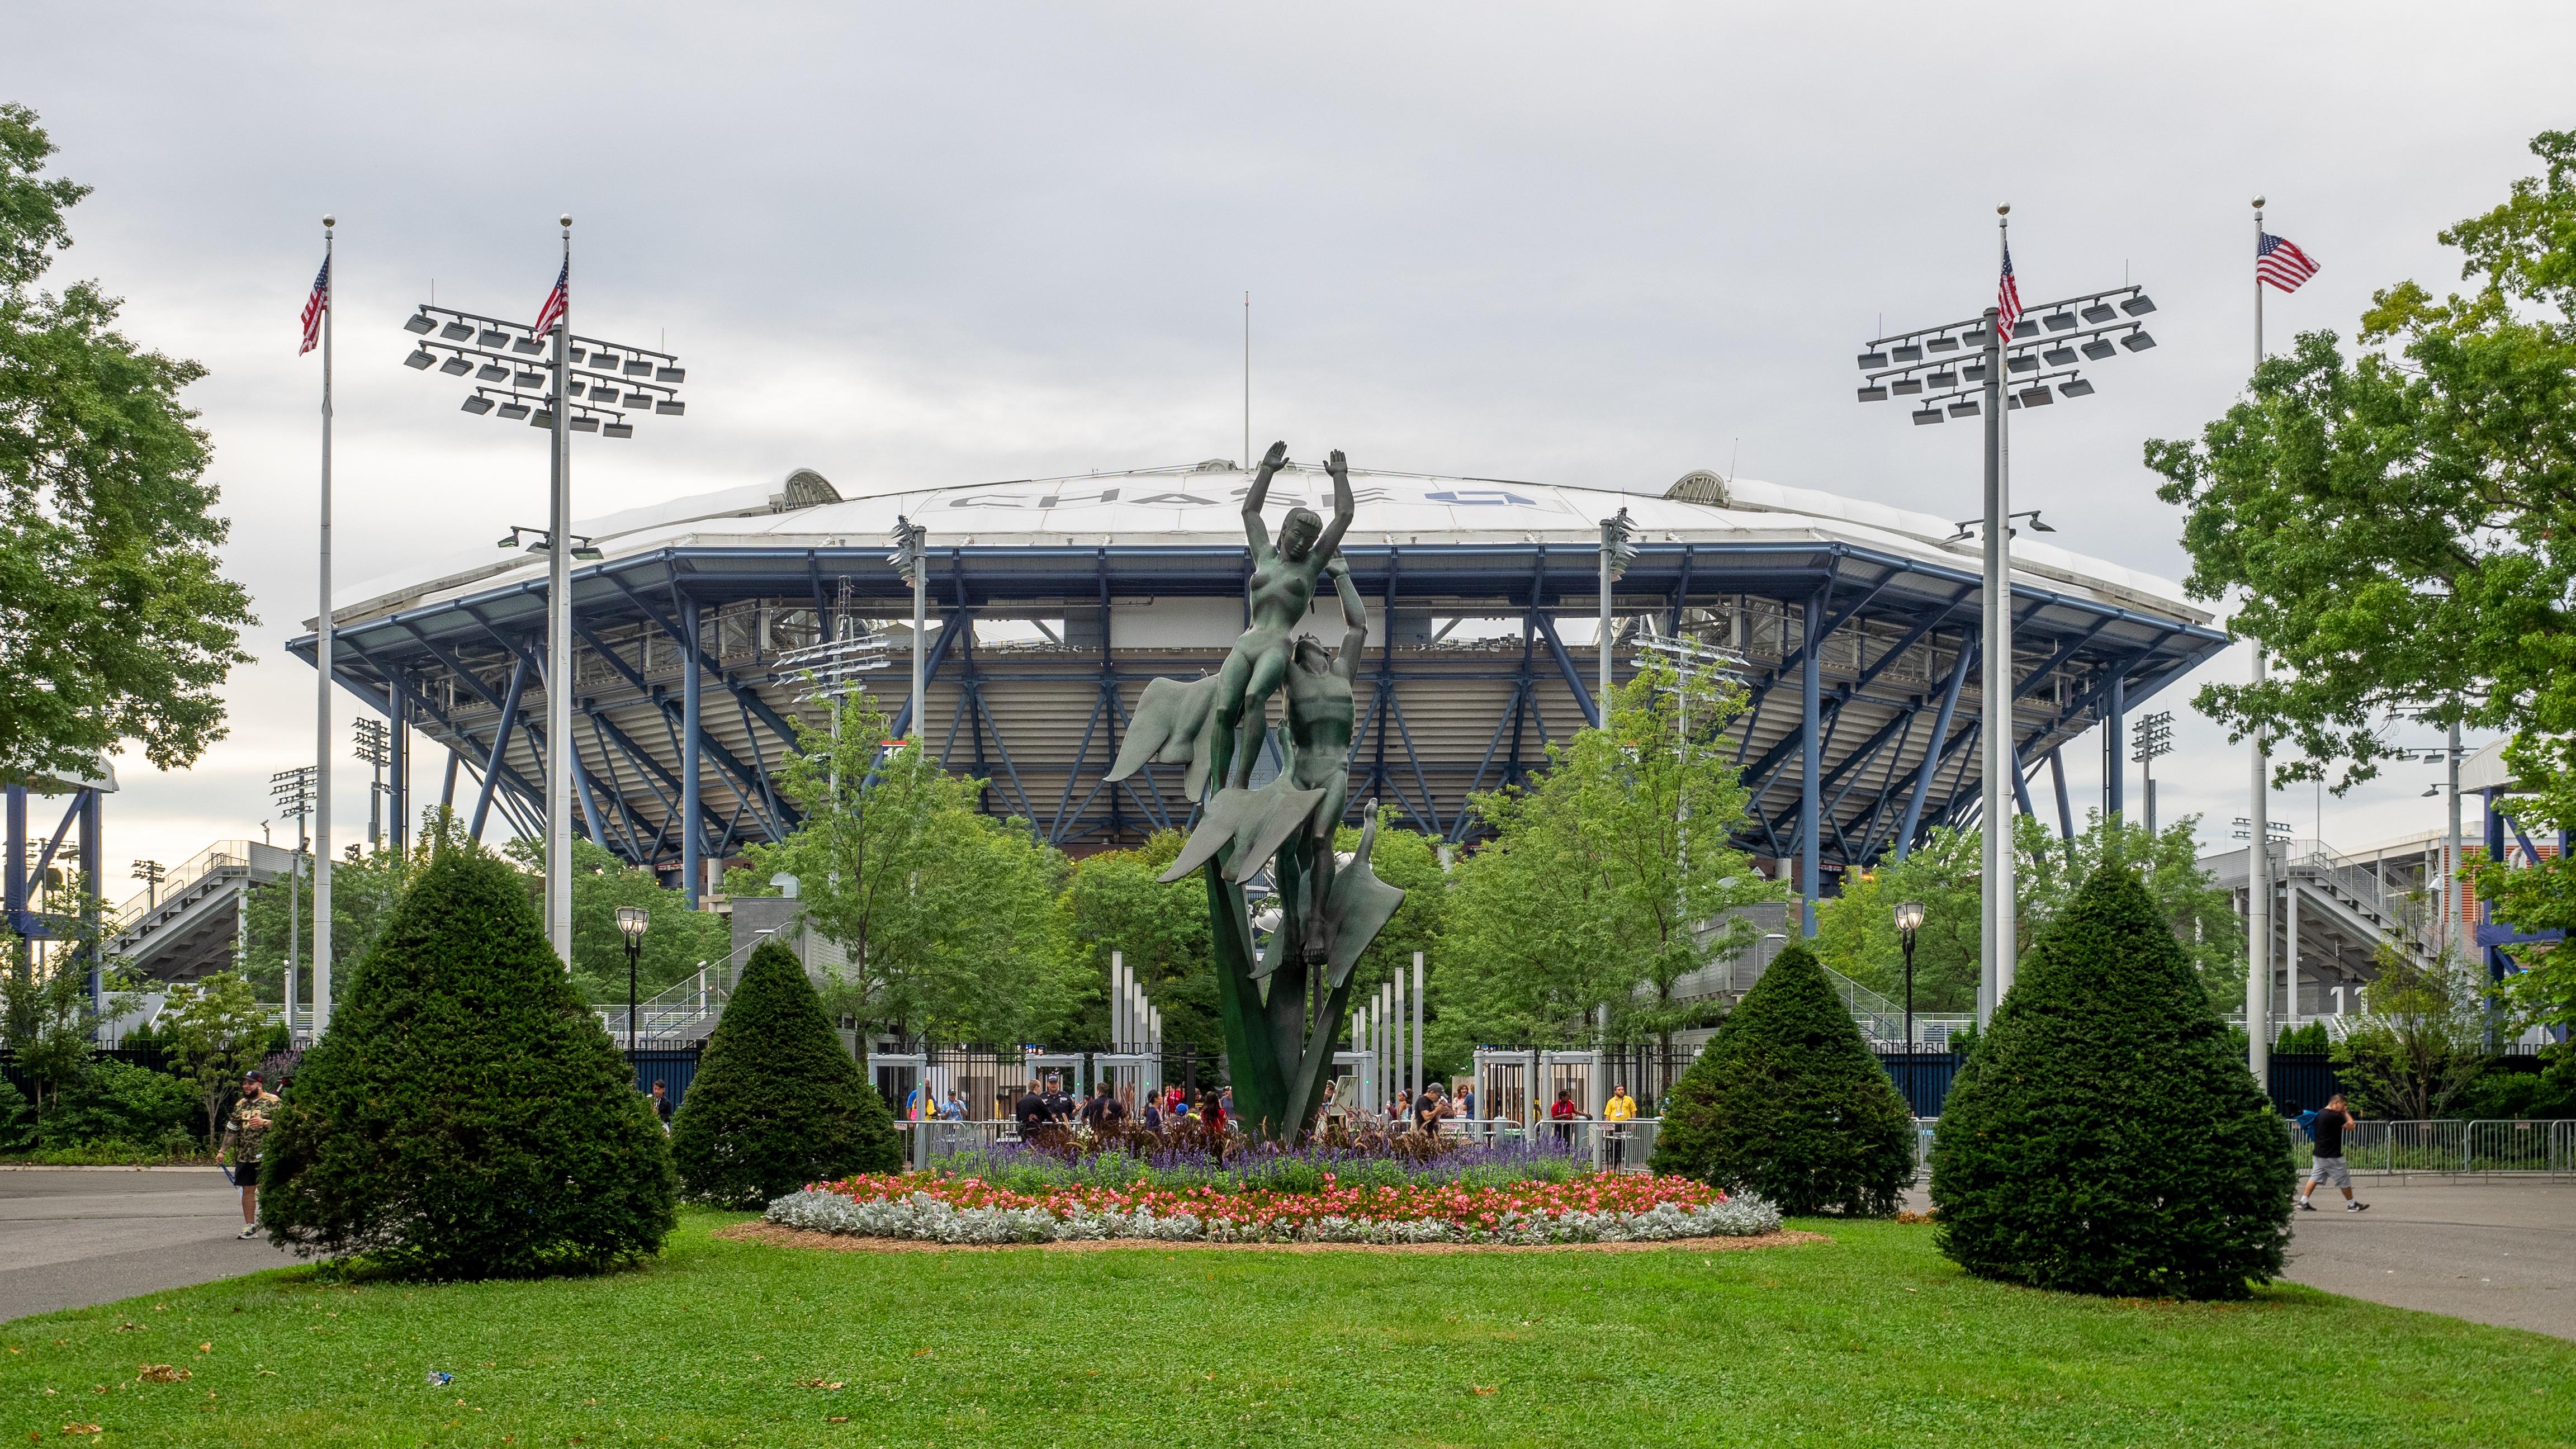 USTA Billie Jean King National Tennis Center - Wikipedia